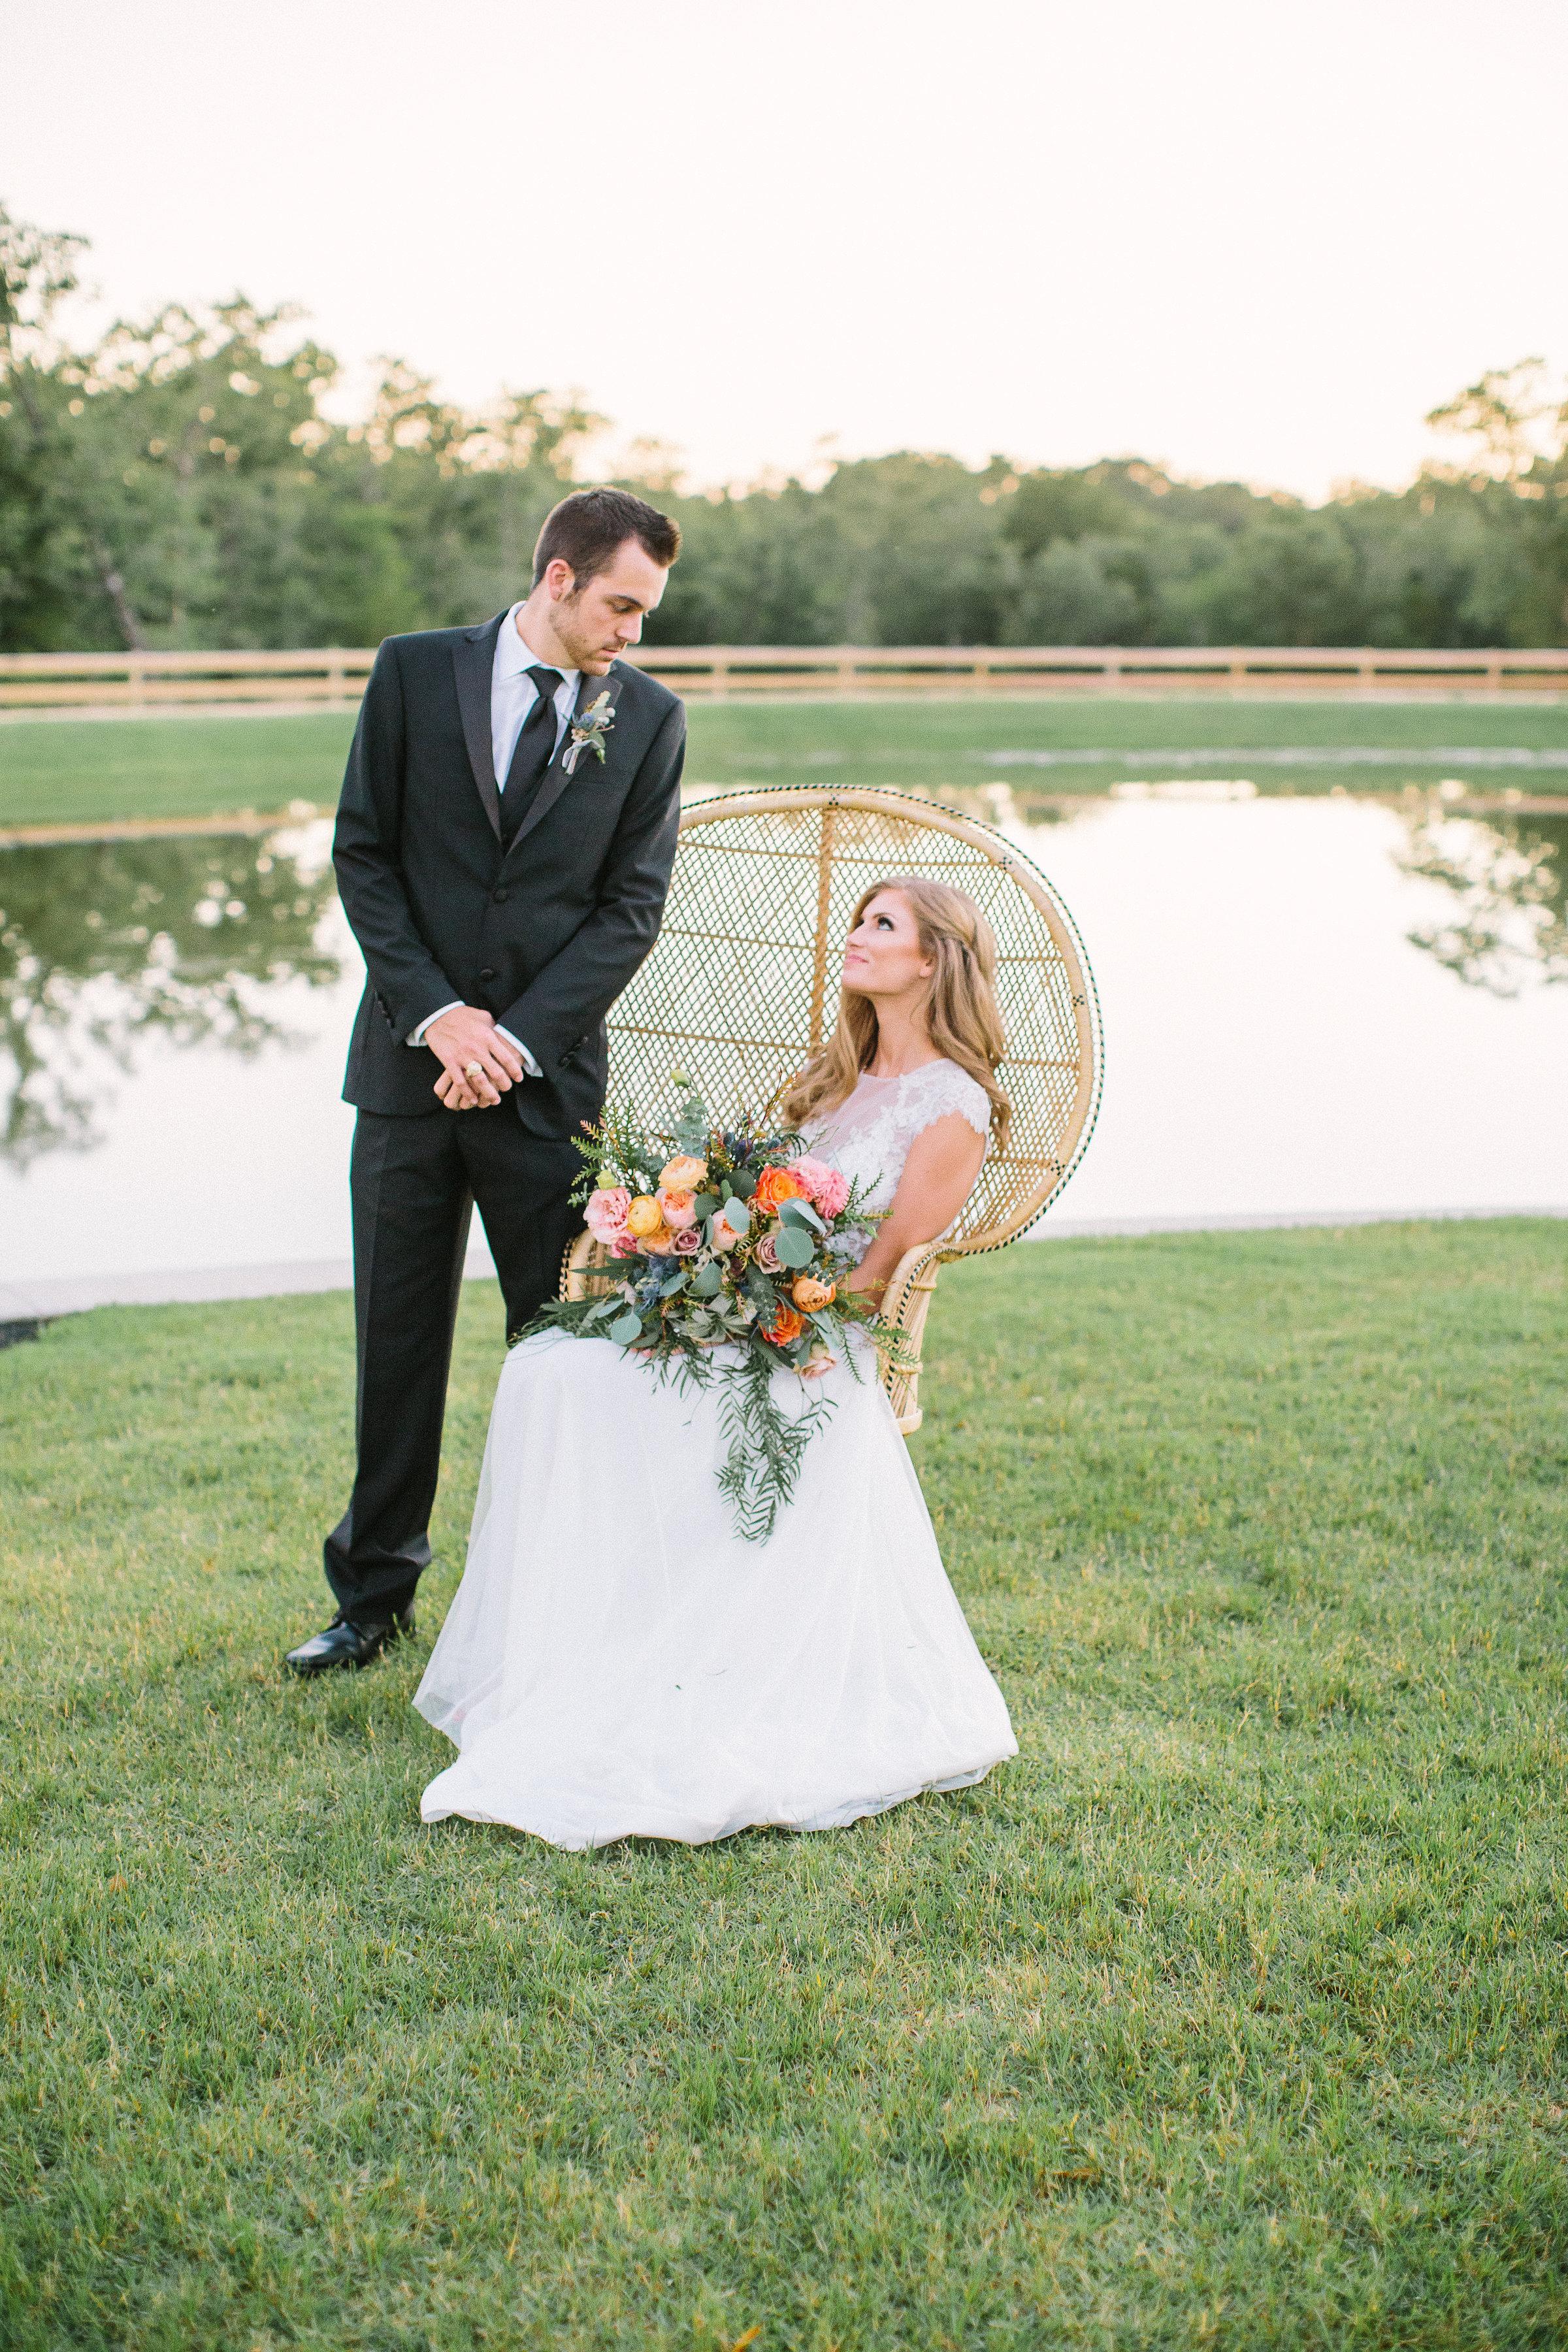 Ellen-Ashton-Photography-Peach-Creek-Ranch-Weddings-Wed-and-Prosper396